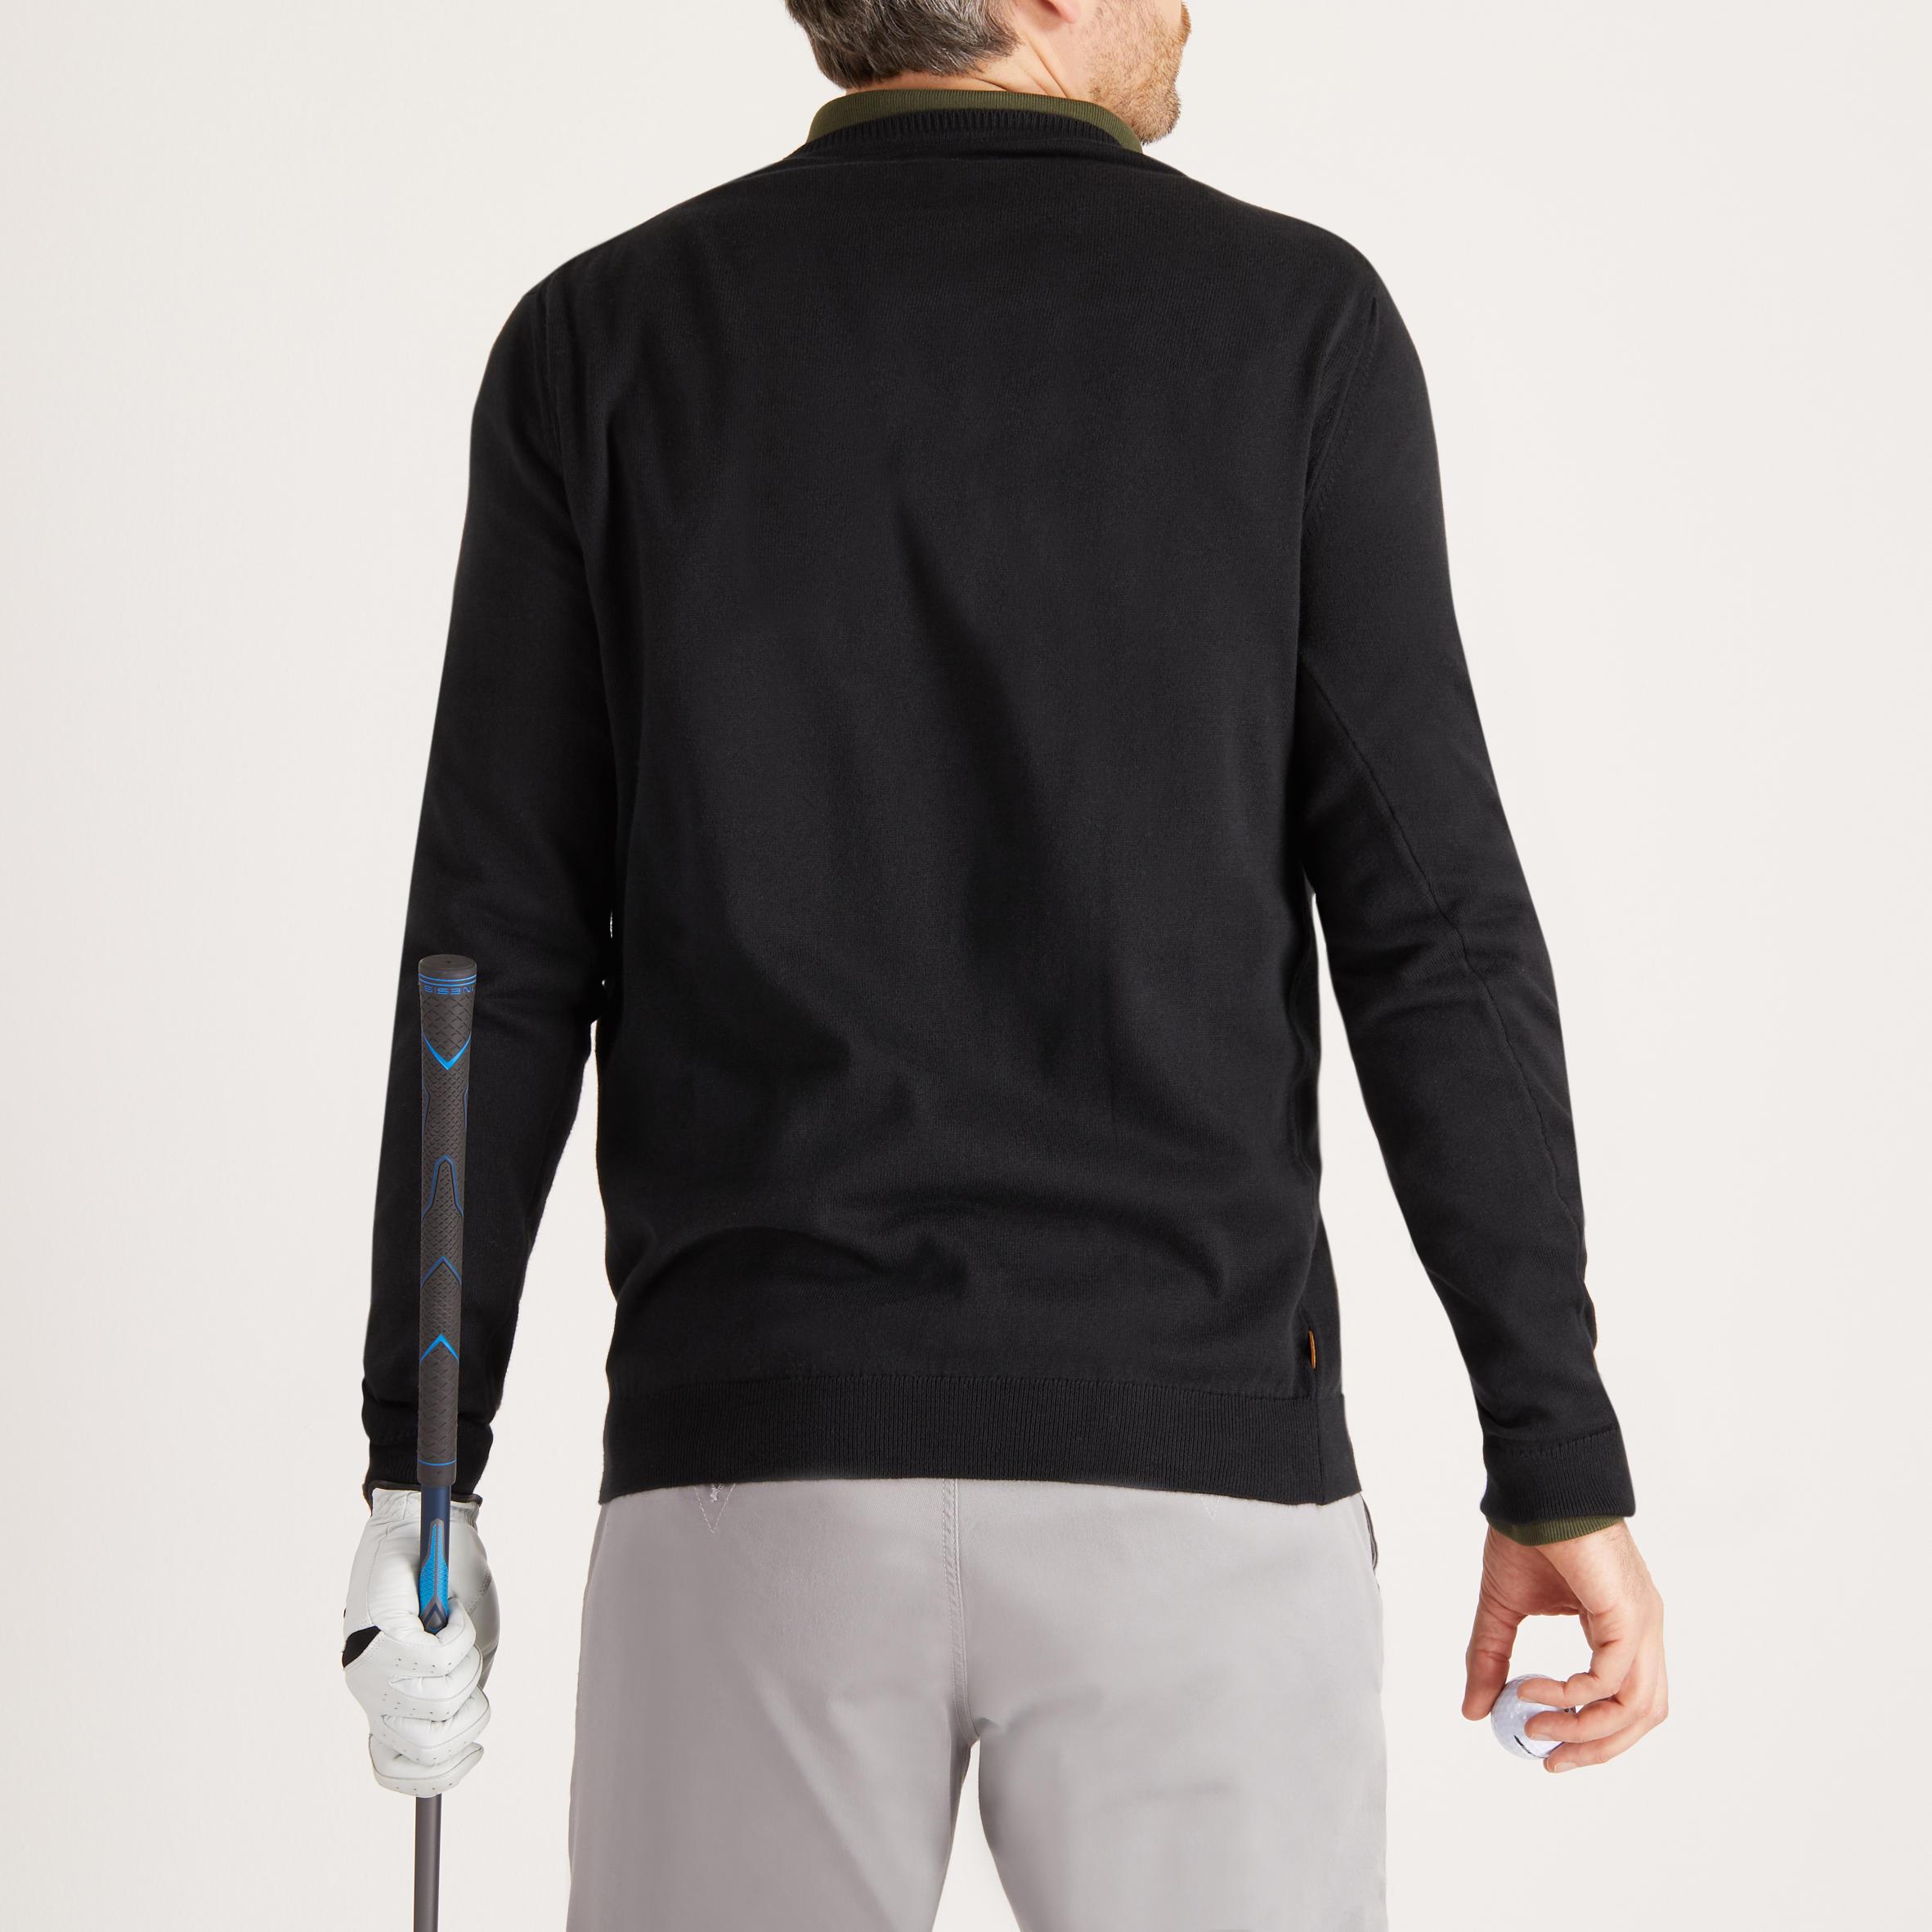 Men's Golf Mild Weather Crew Neck Sweater Black